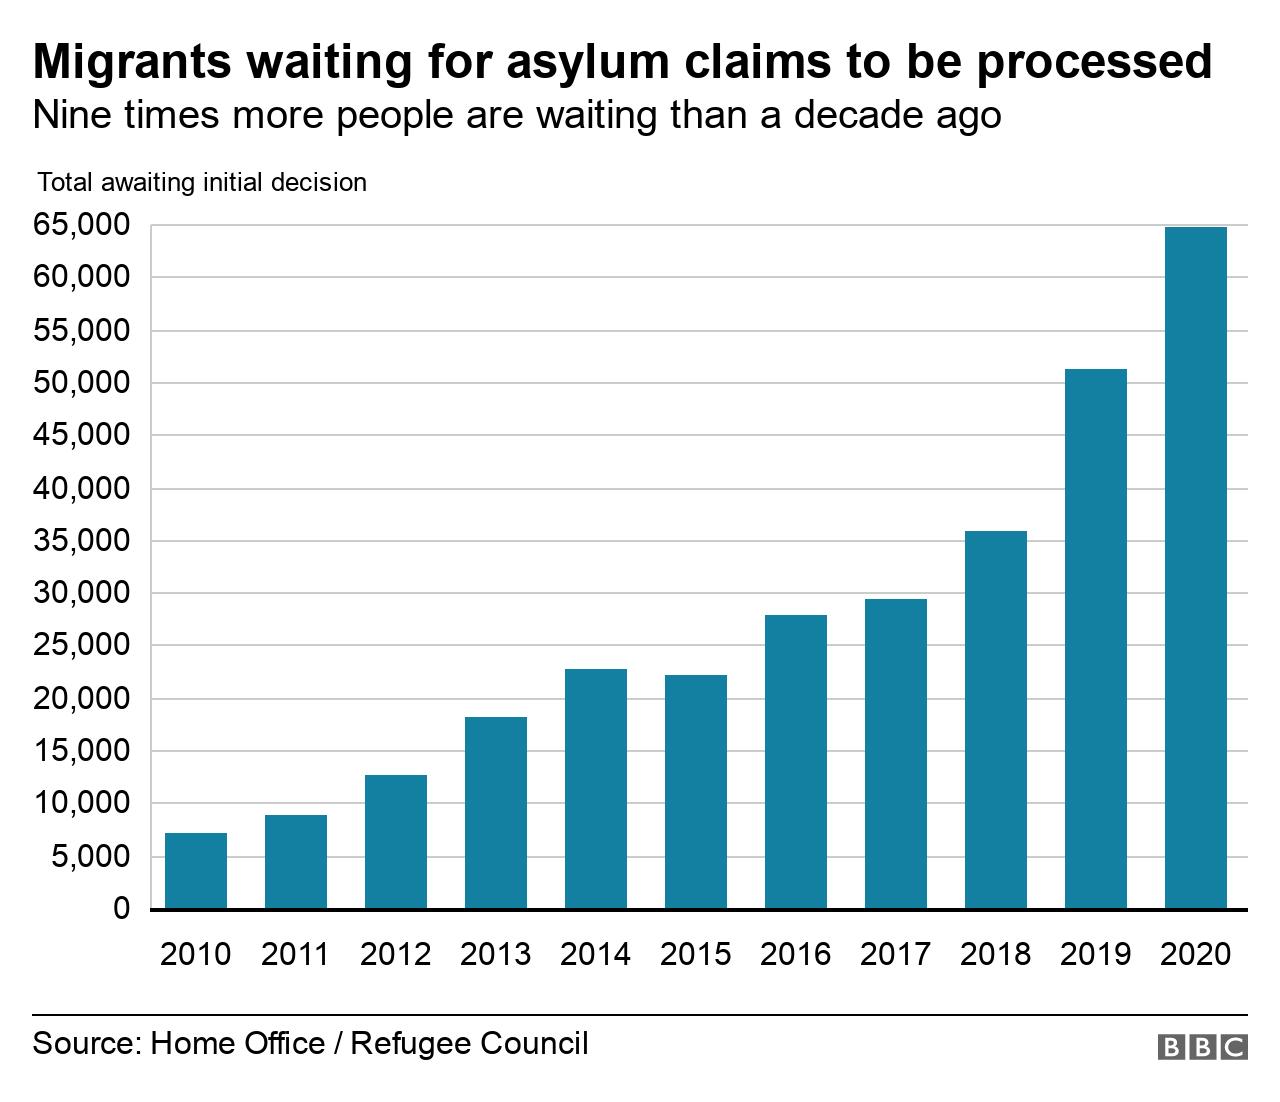 Graphic showing ninefold increase in asylum seeker queue over 10 years